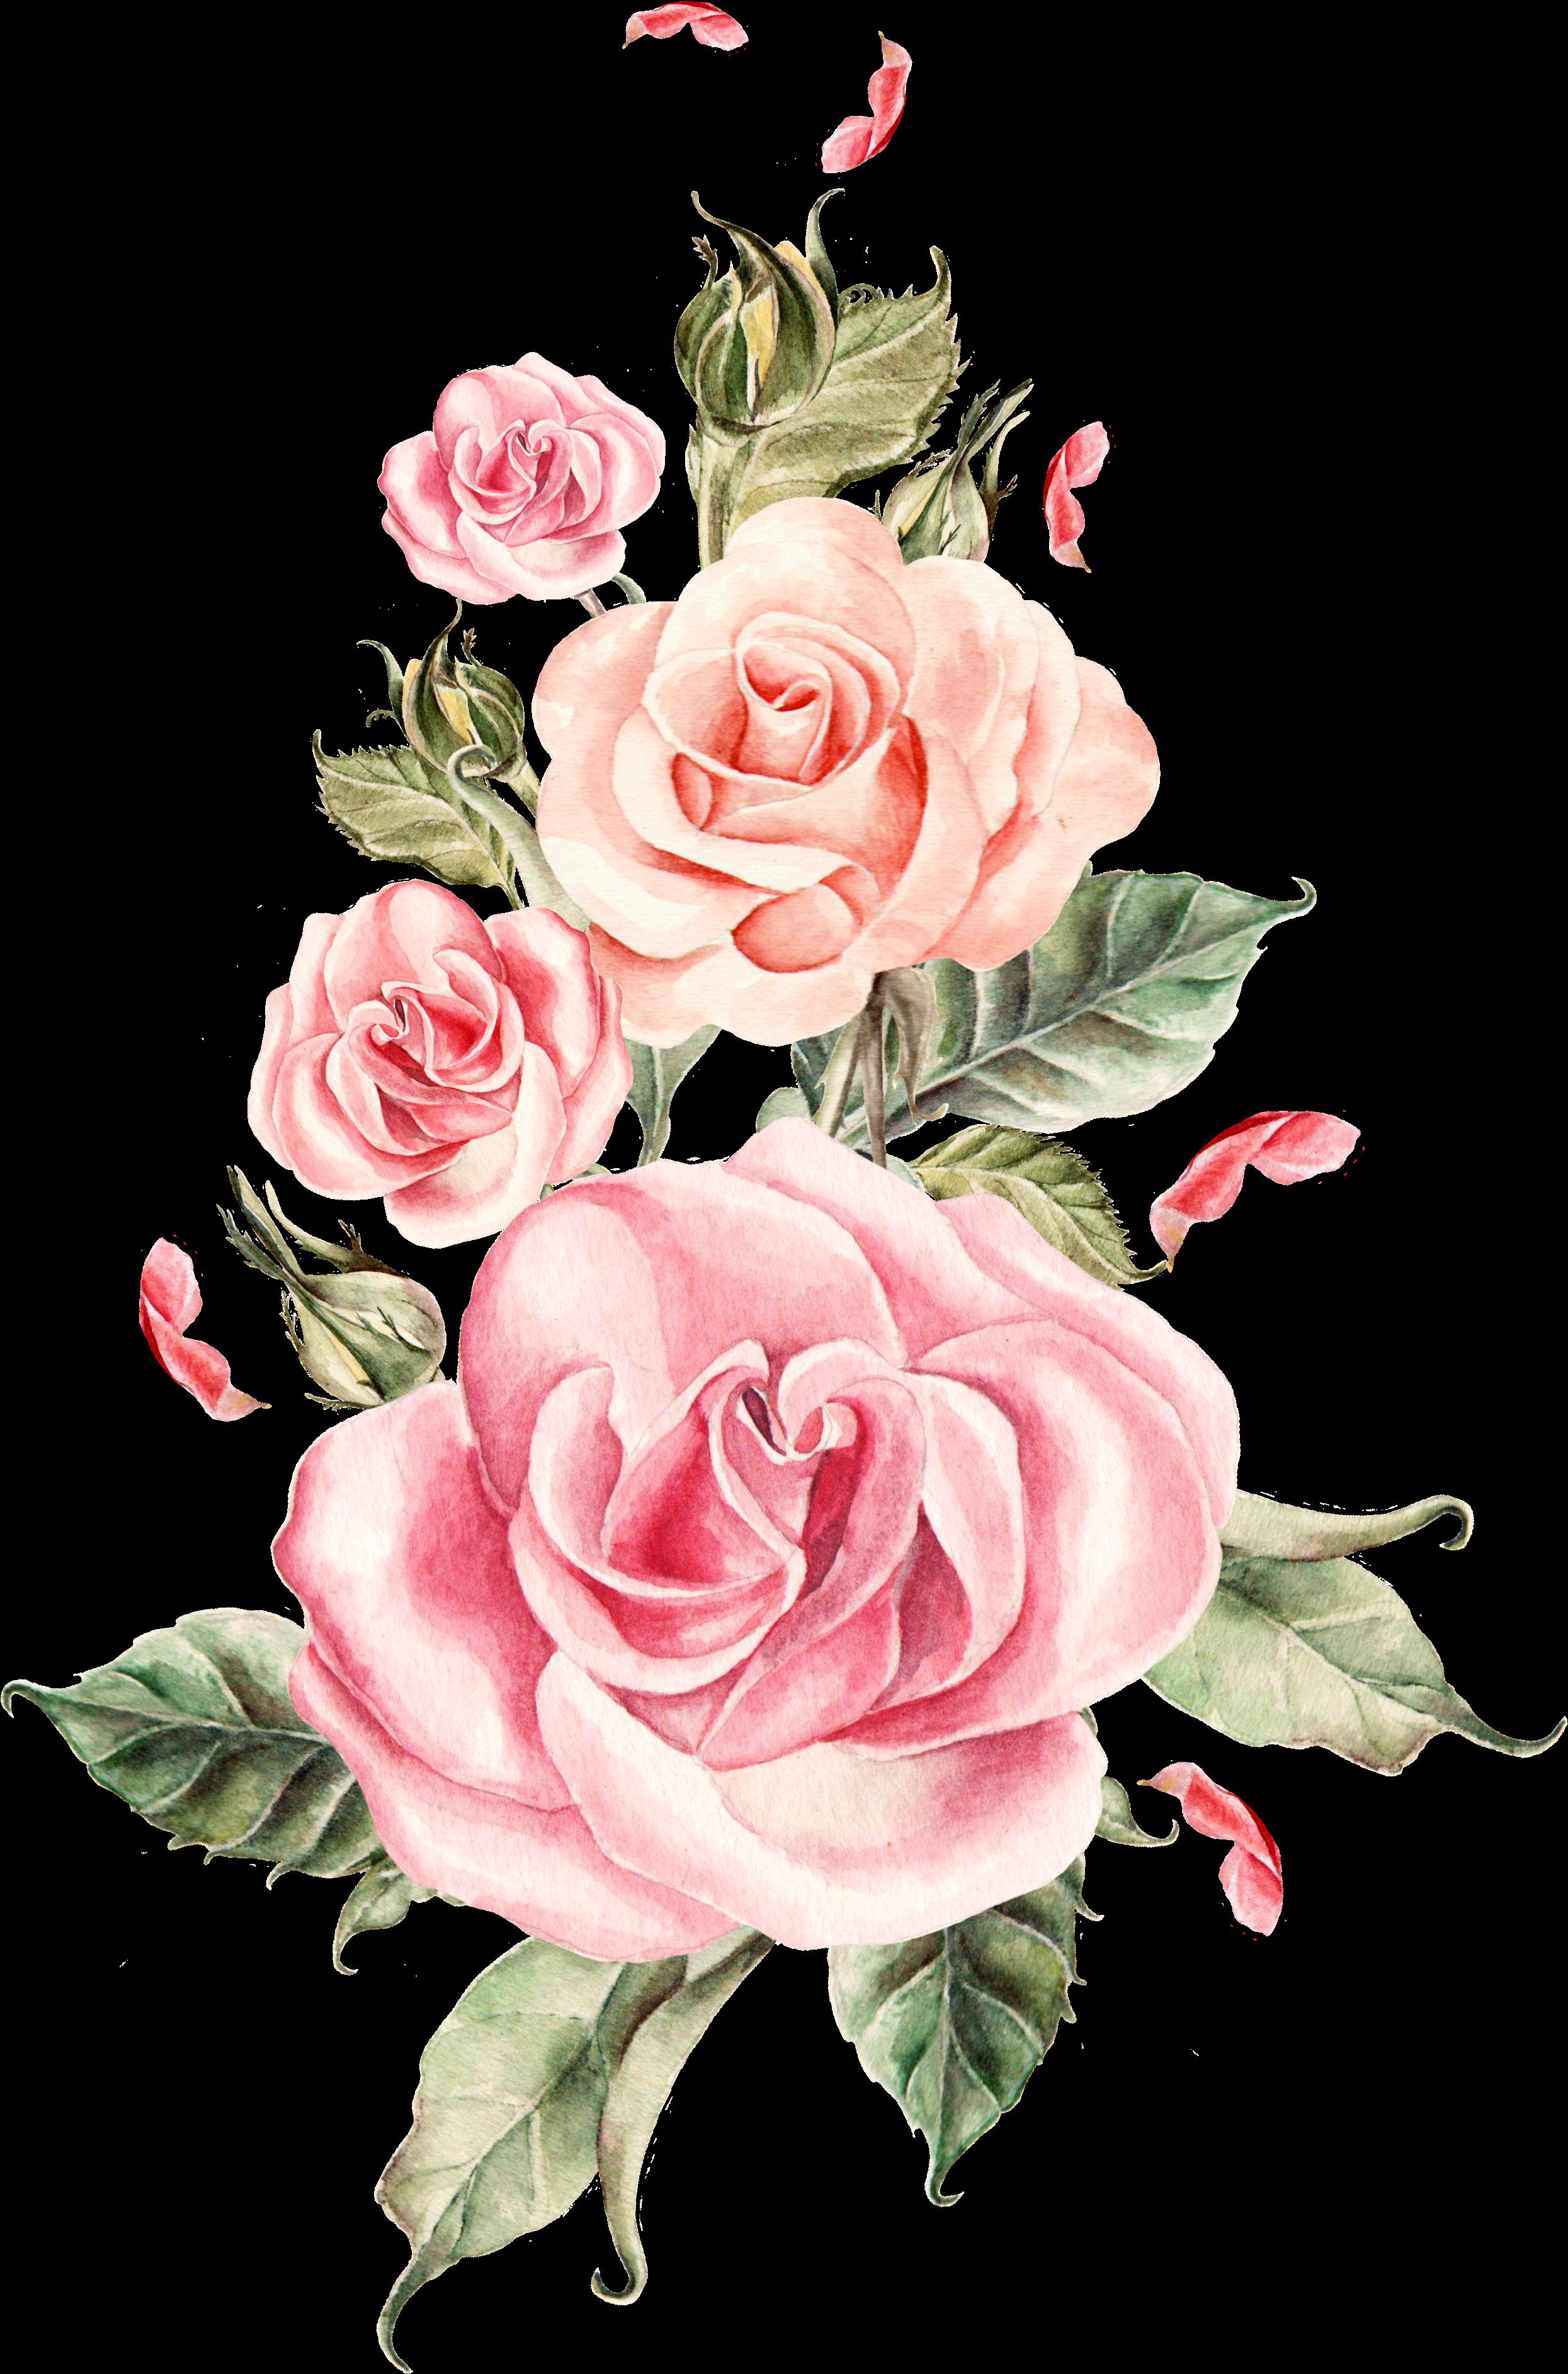 HD Pink Flower Bouquet Rose Roses Wedding Hand.